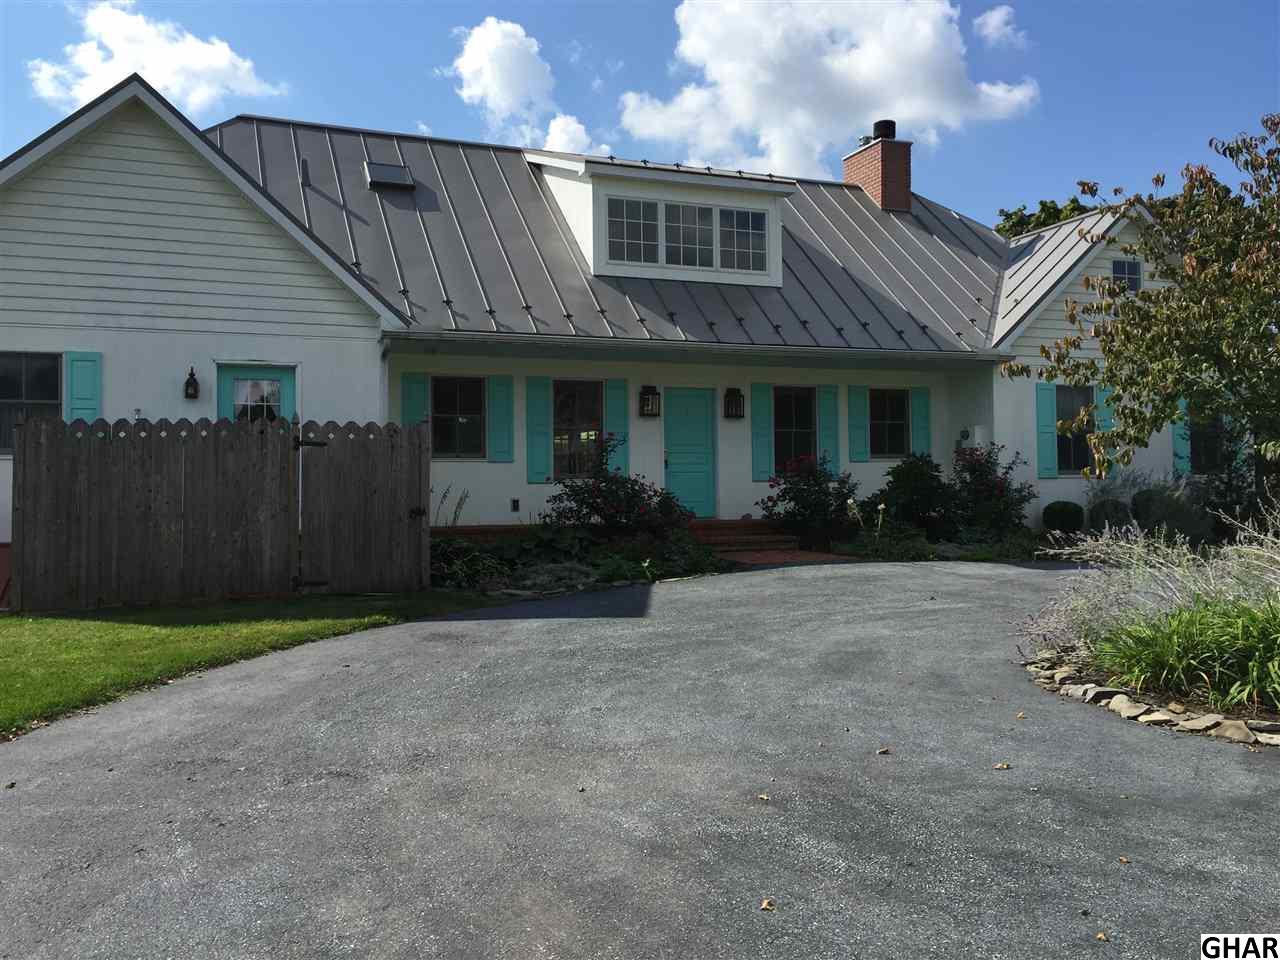 Rental Homes for Rent, ListingId:35747867, location: 54 Warrington rd Wellsville 17365